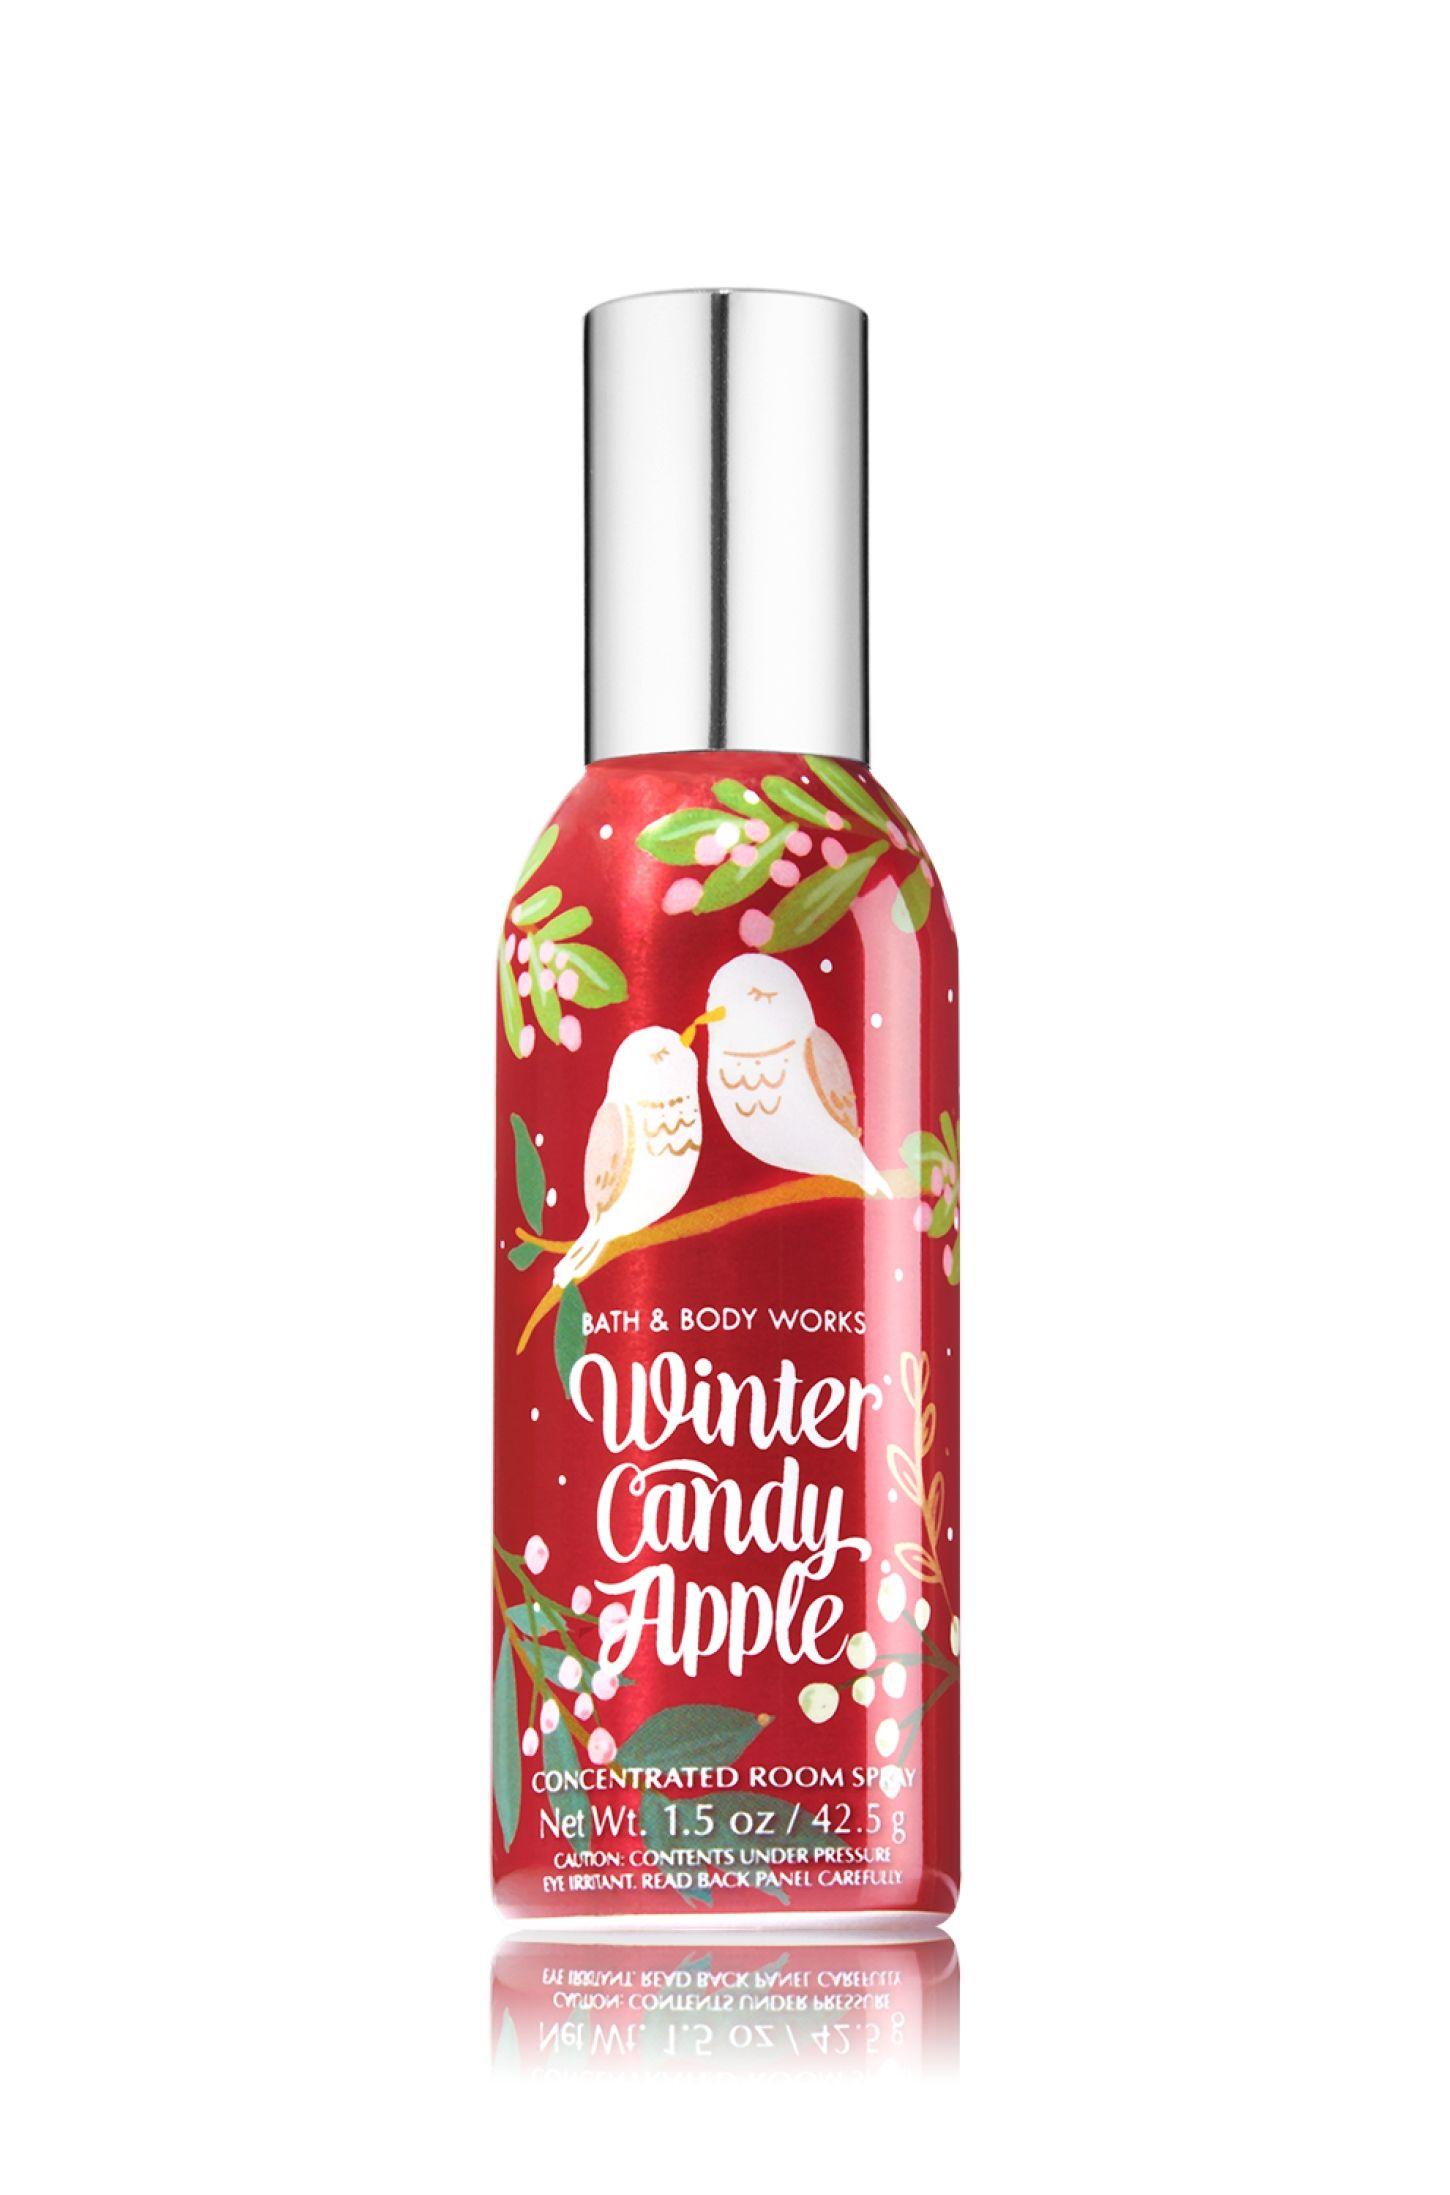 Winter Candy Apple 1.5 oz. Room Perfume - Home Fragrance 1037181 - Bath & Body Works